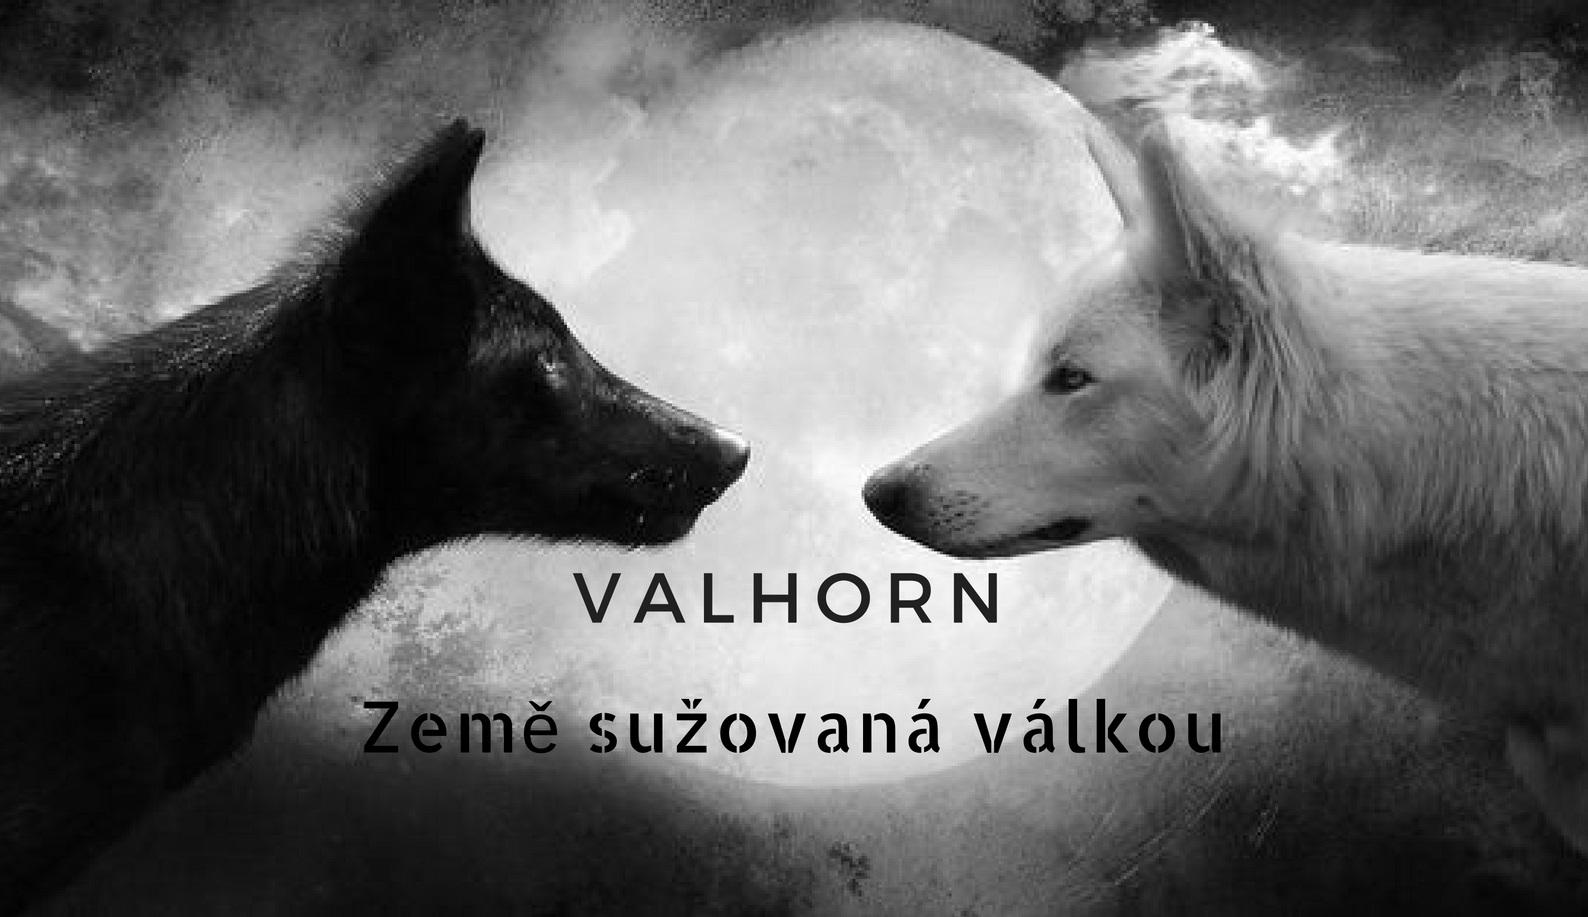 Valhorn